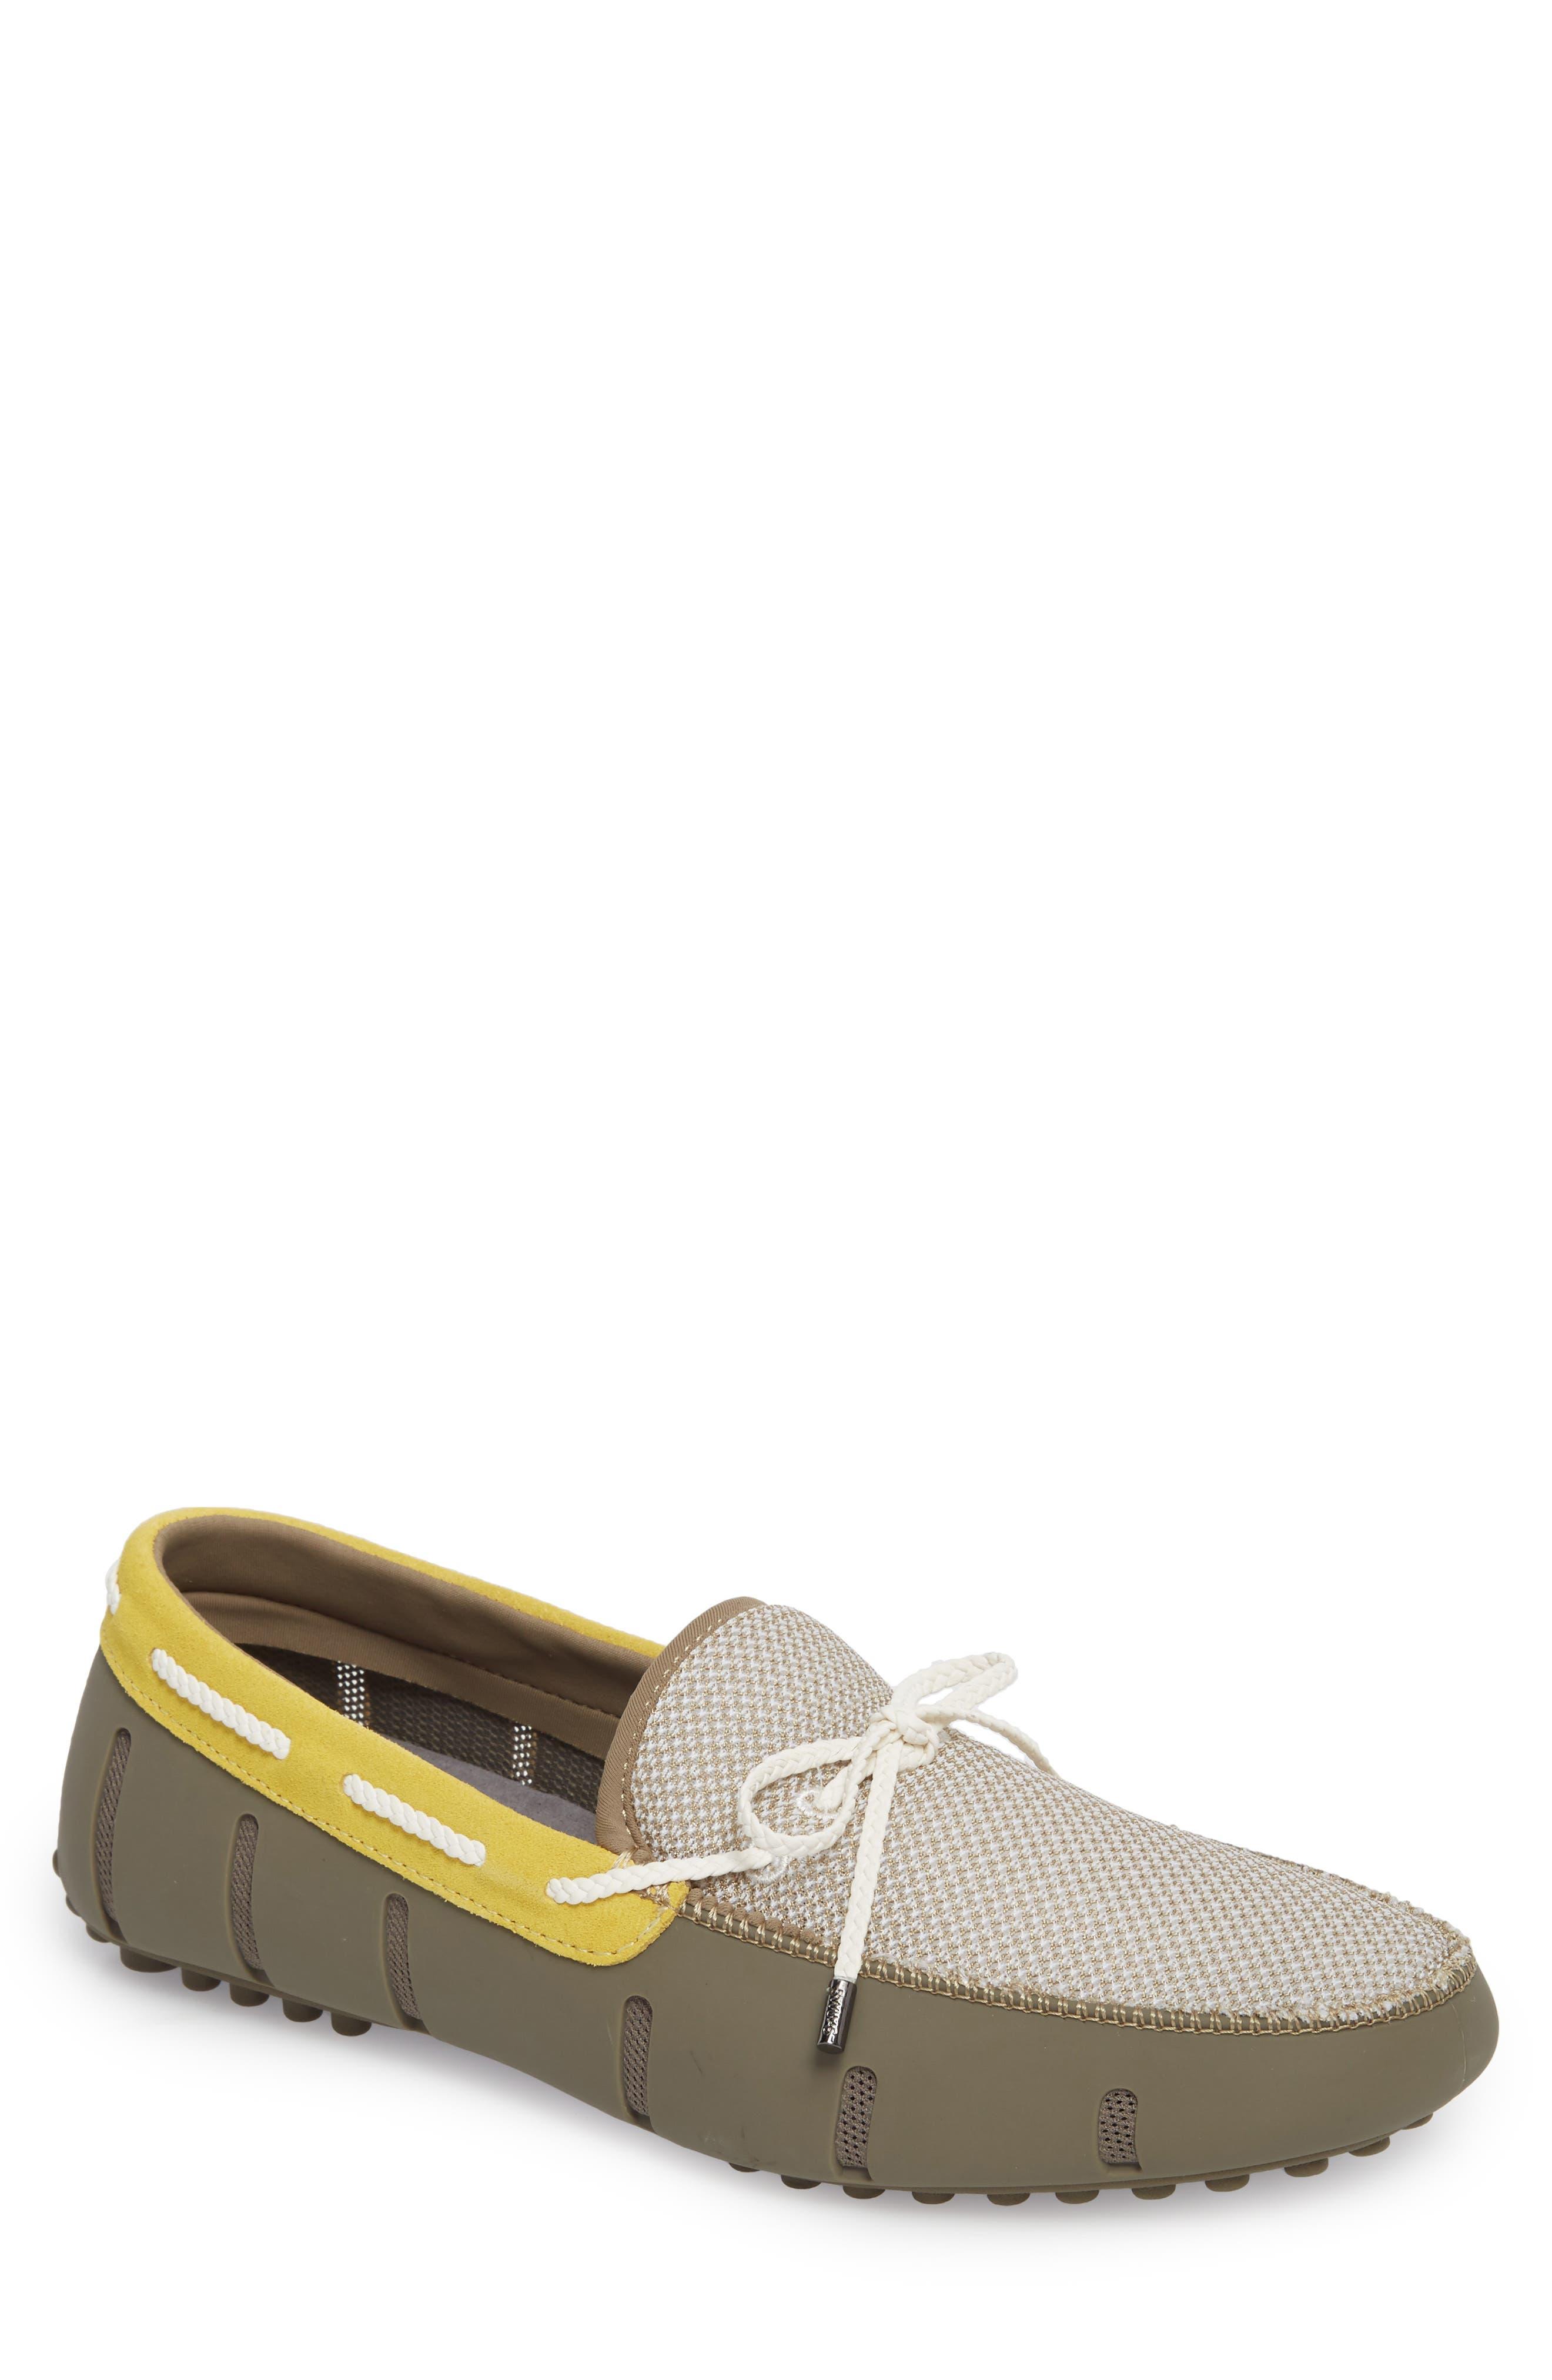 Driving Shoe,                         Main,                         color, KHAKI/ FADED LEMON/ WHITE